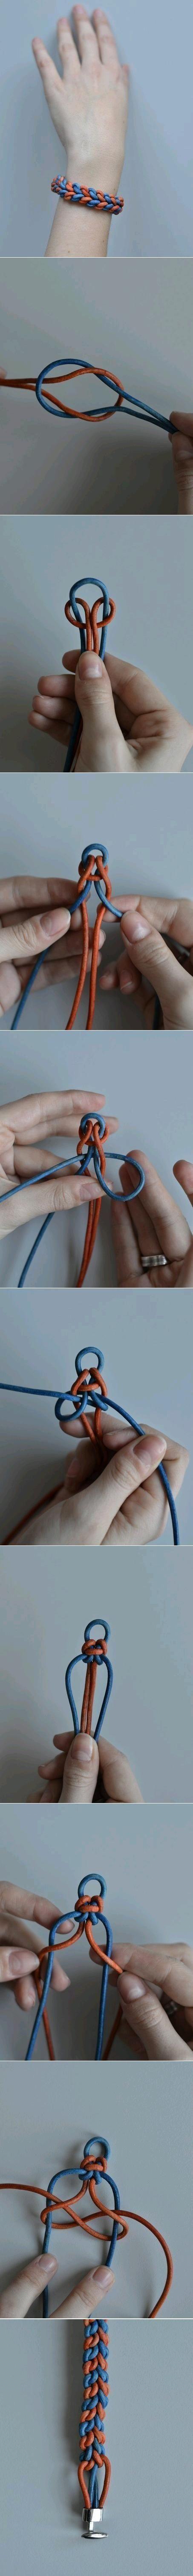 DIY Handmade Bracelet DIY Handmade Bracelet by diyforever